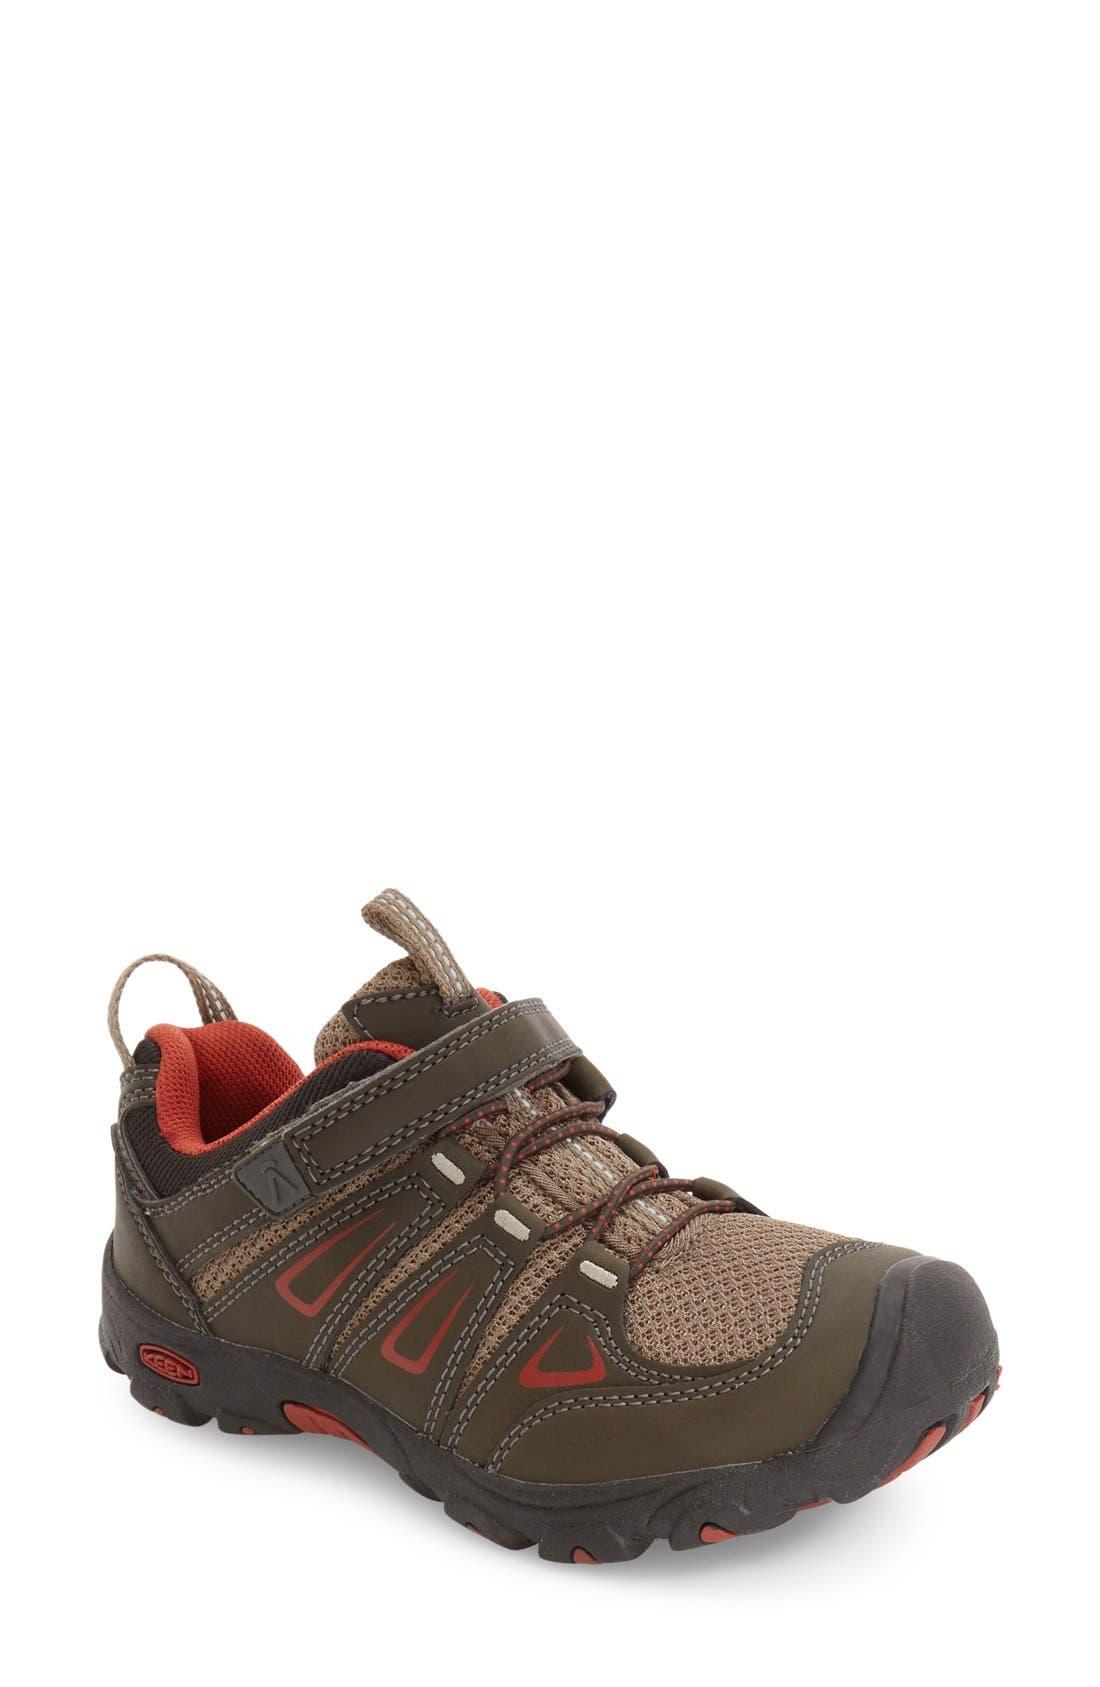 Keen Oakridge Hiking Shoe (Toddler, Little Kid & Big Kid)